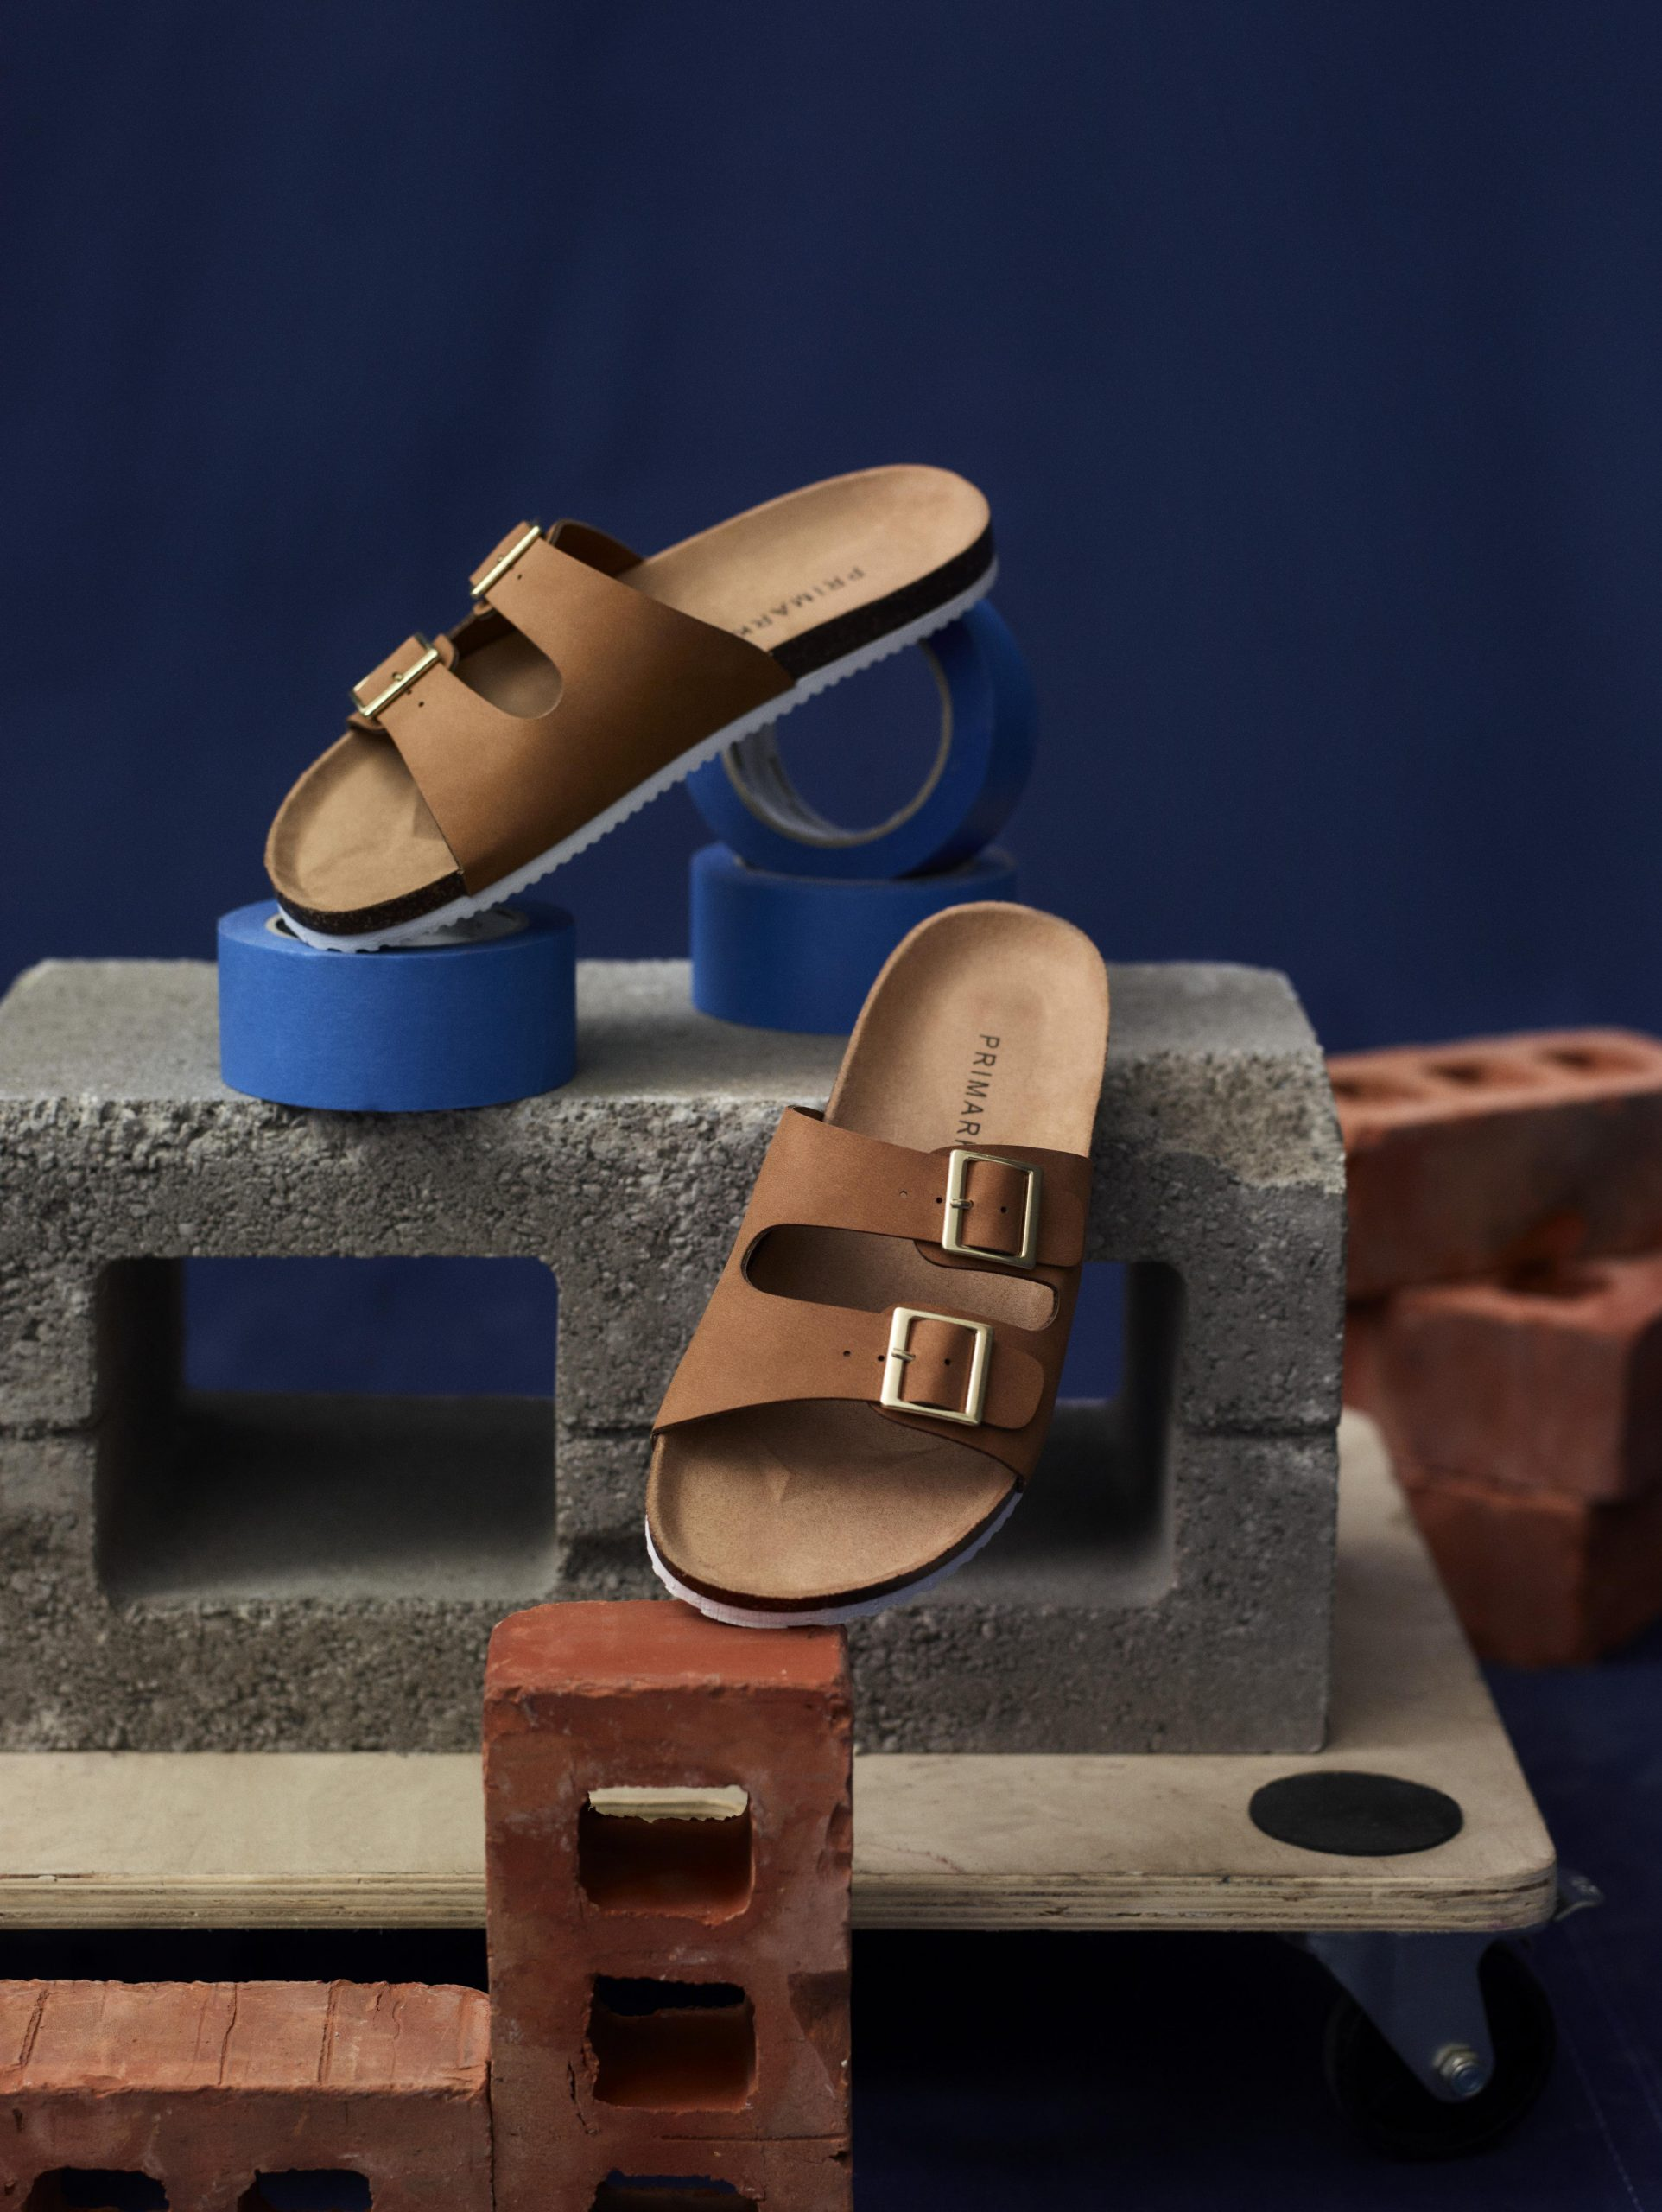 Calzado Primark, sandalias